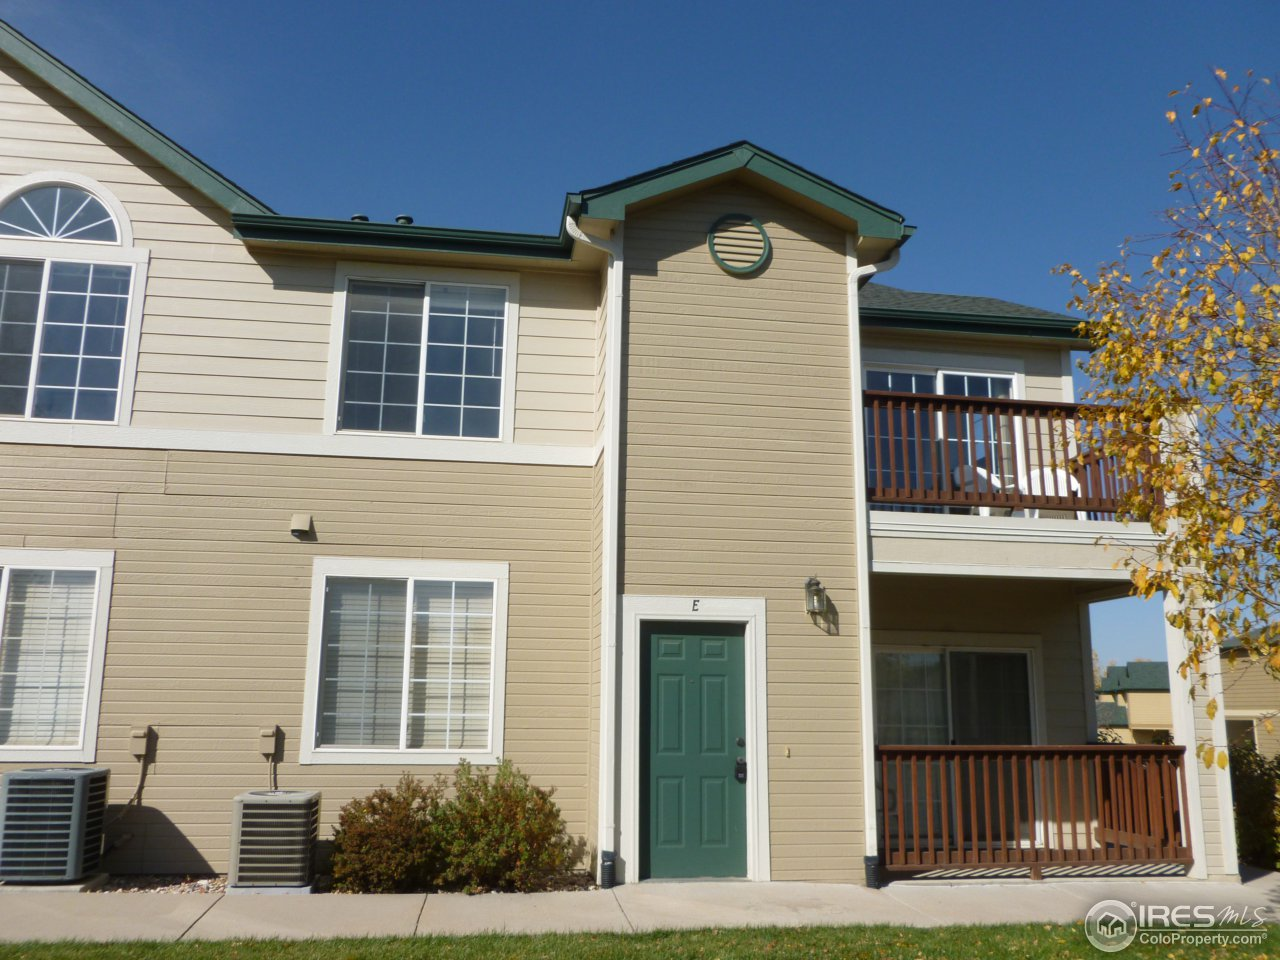 3002 W Elizabeth St 18E, Fort Collins CO 80521